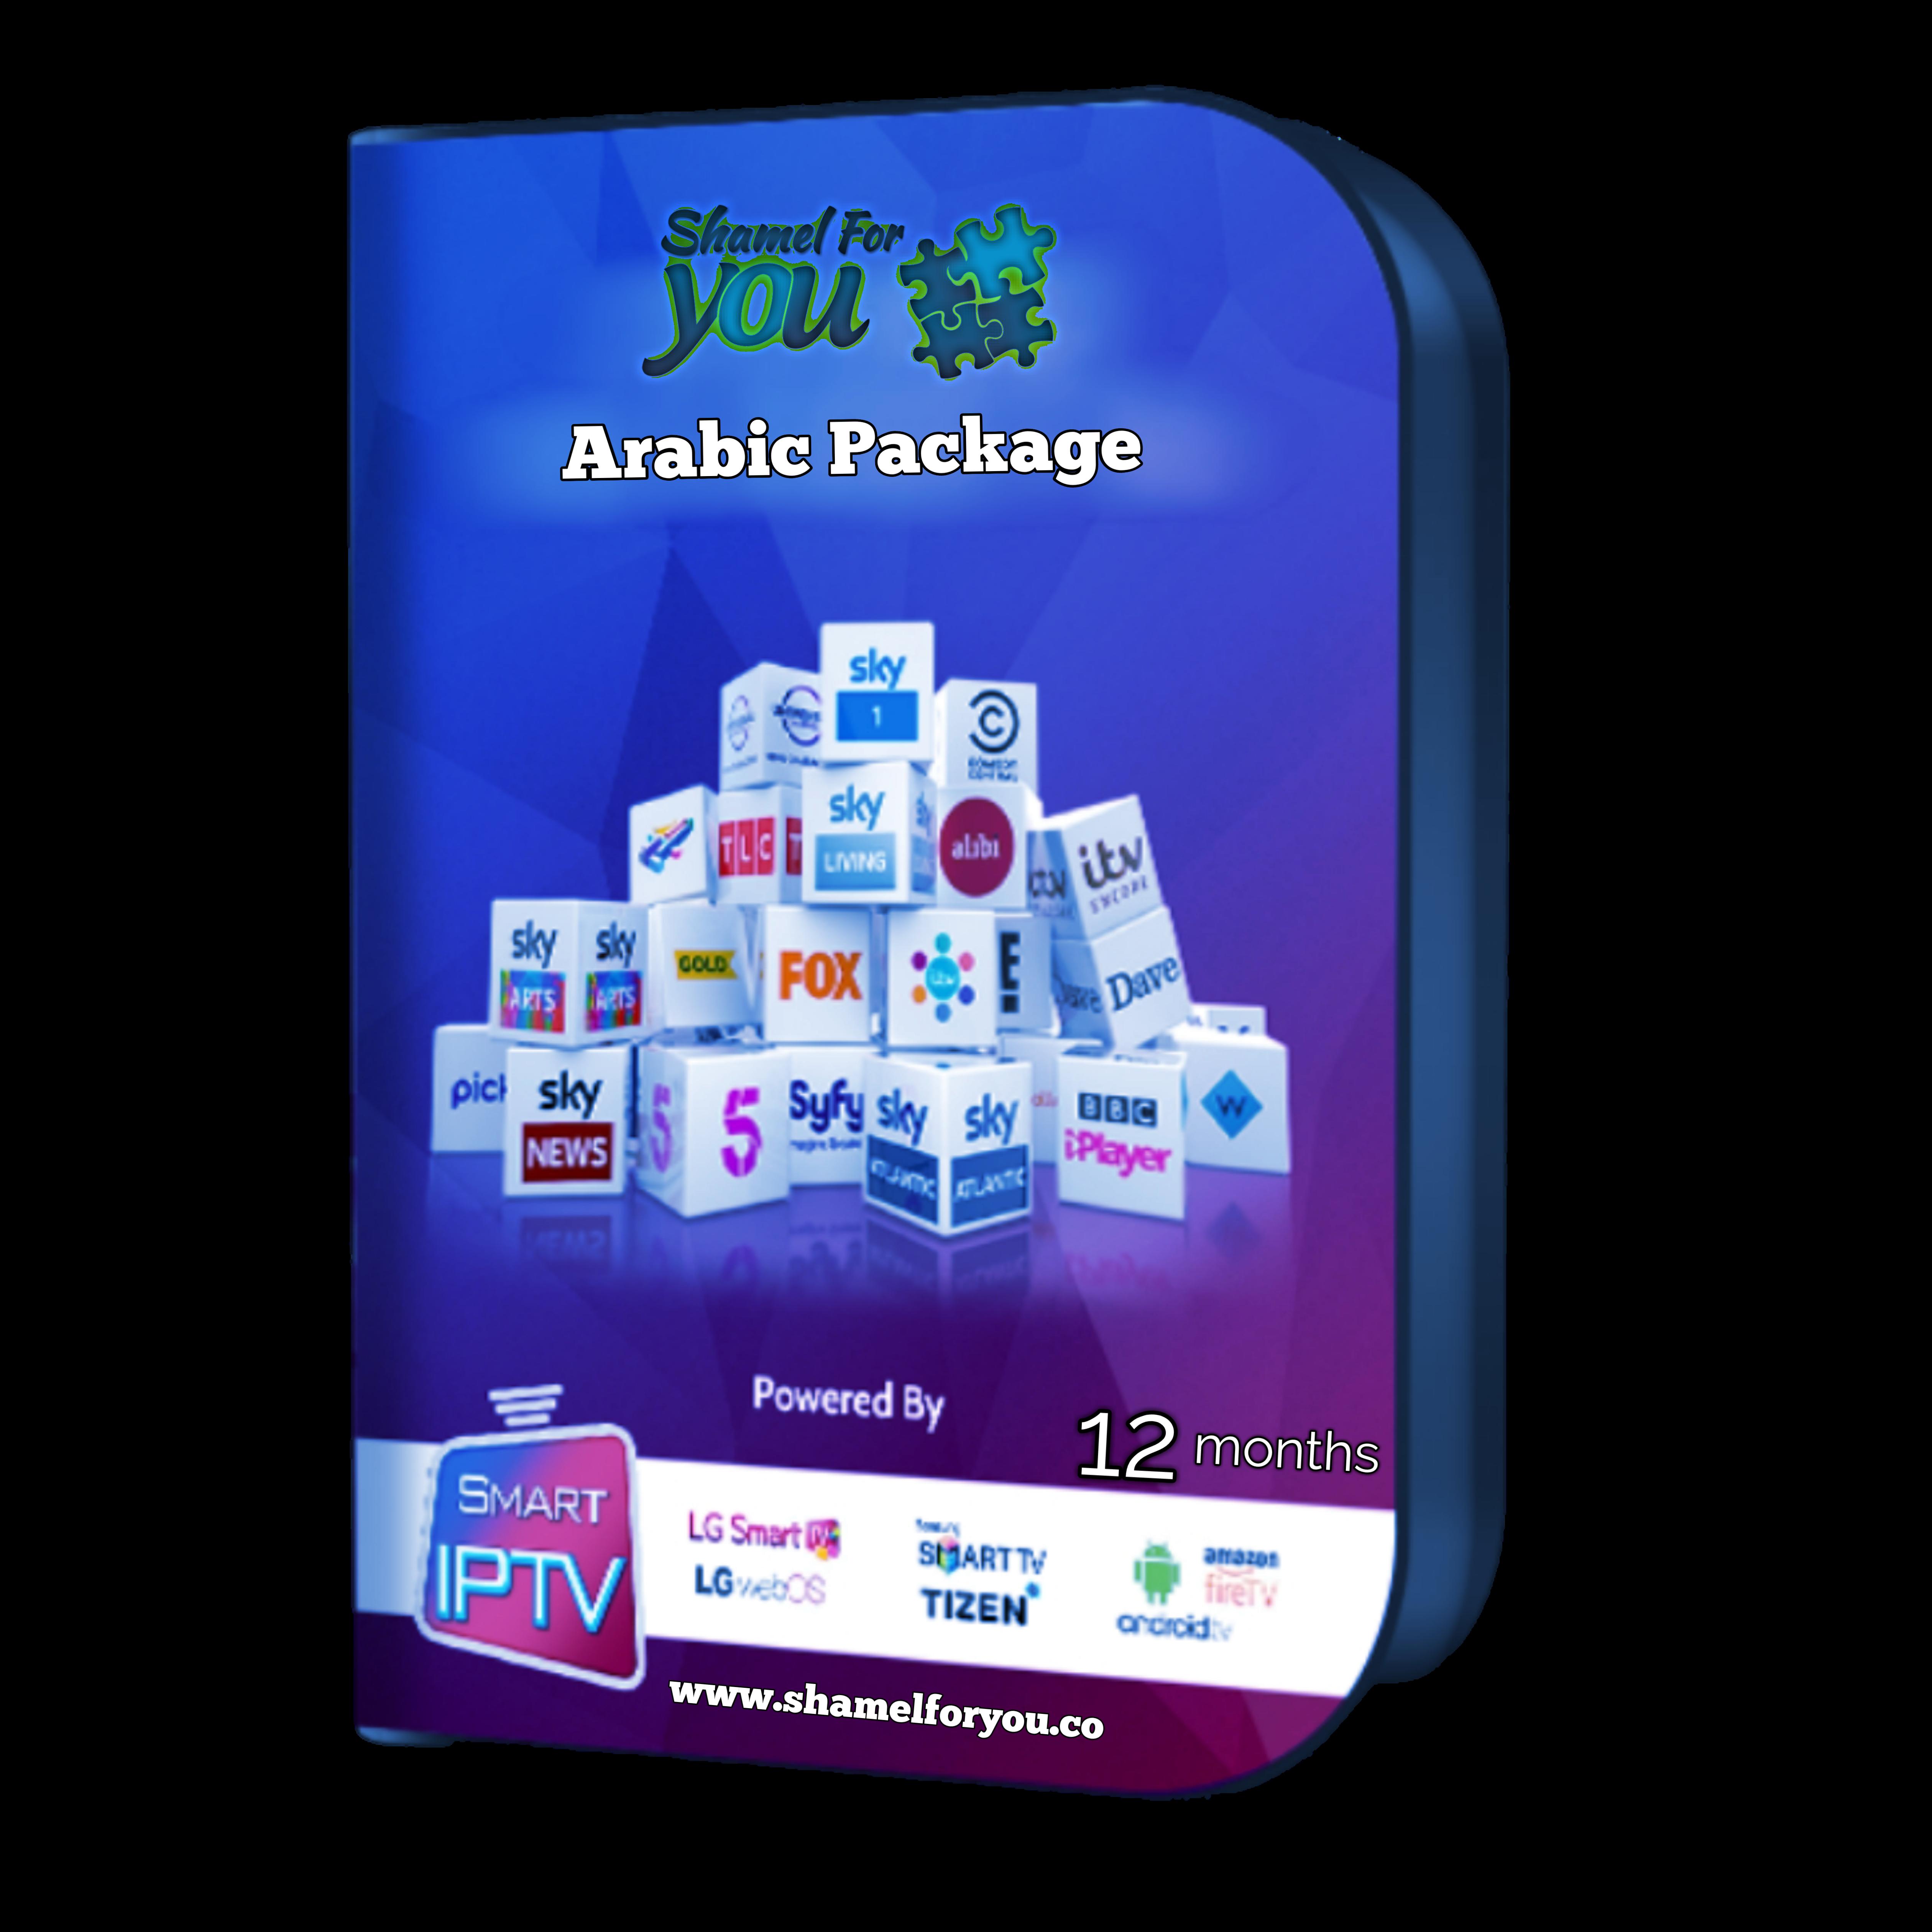 IPTV Shamel 4 You 12 months arabic 00354